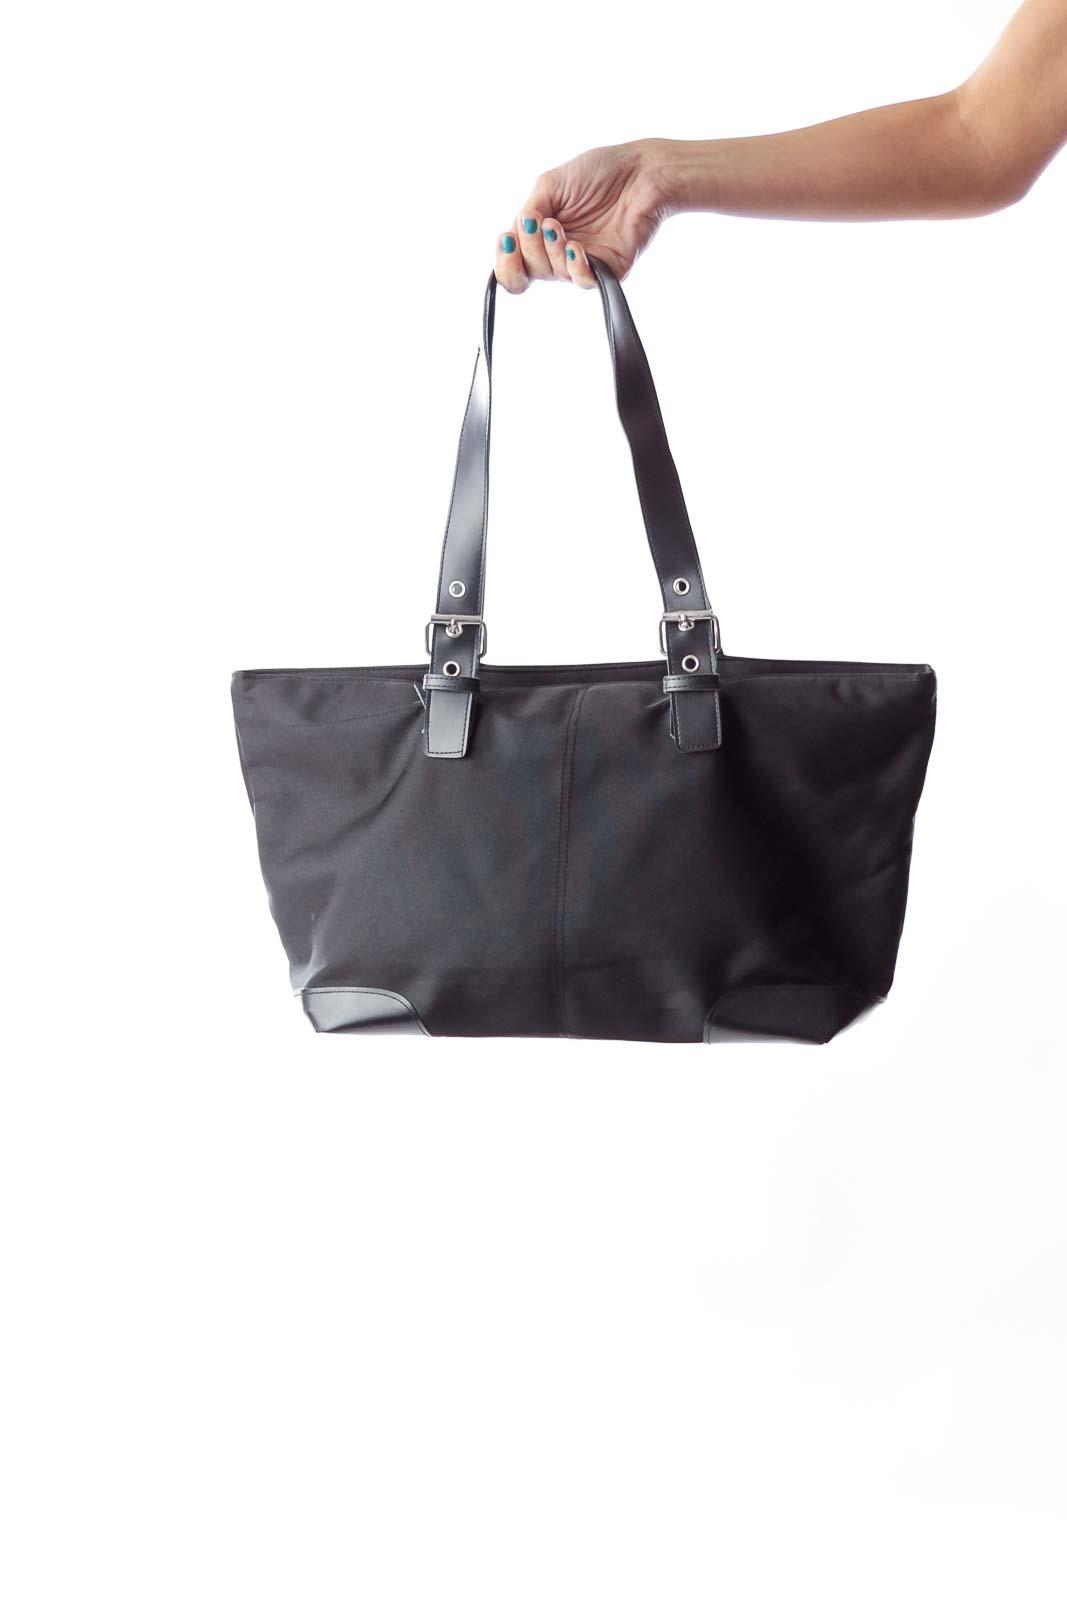 Black Nylon Tote Bag Front